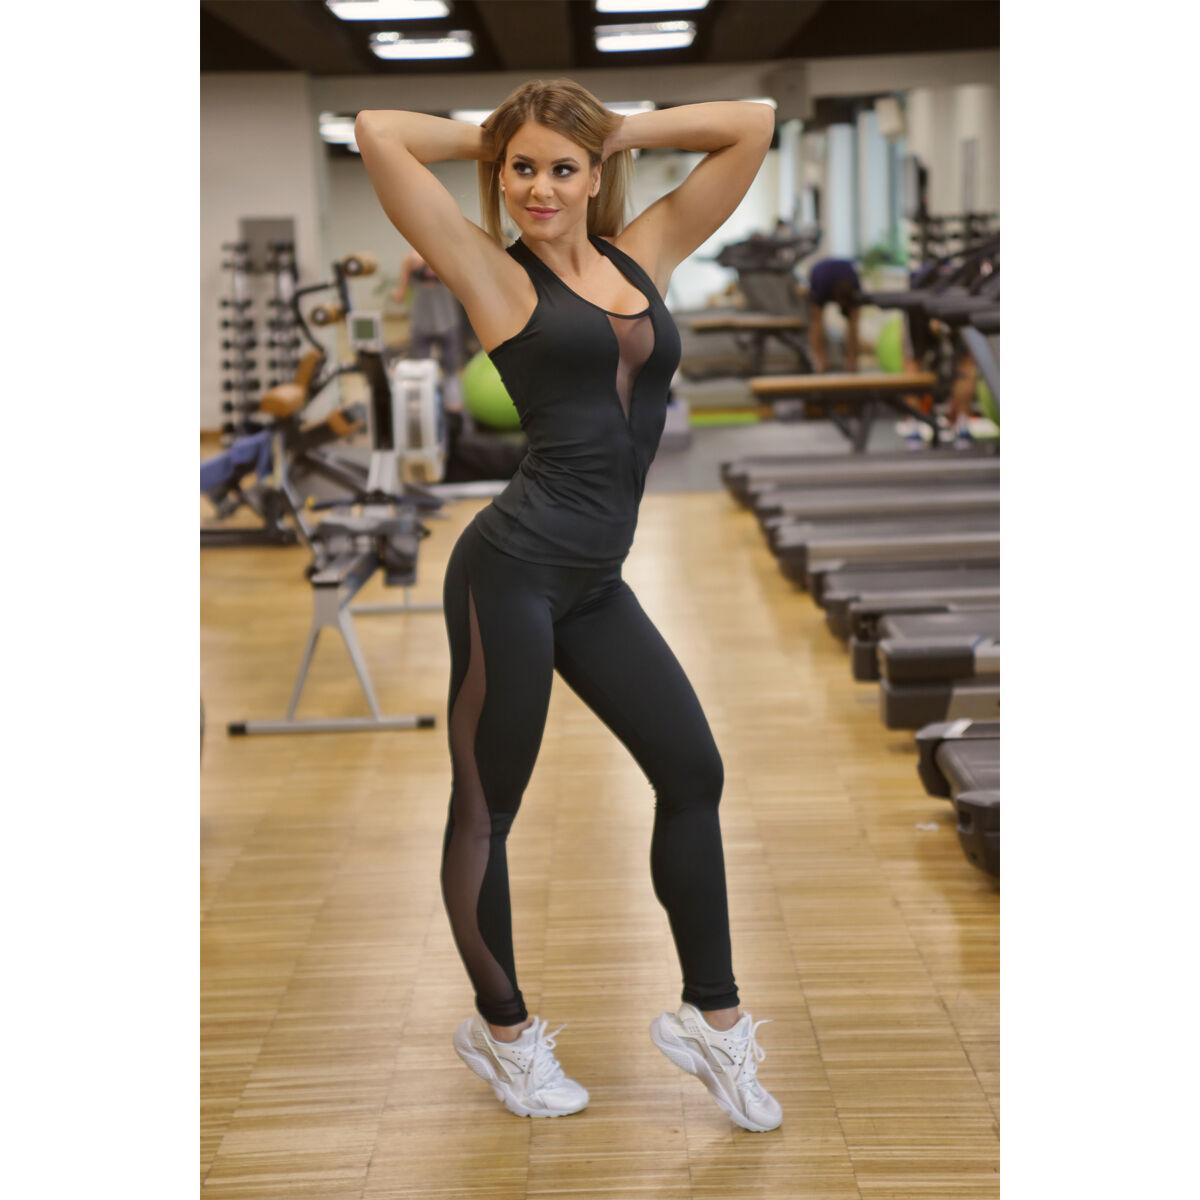 Flame női fitness tüll leggings + atléta szett, fekete